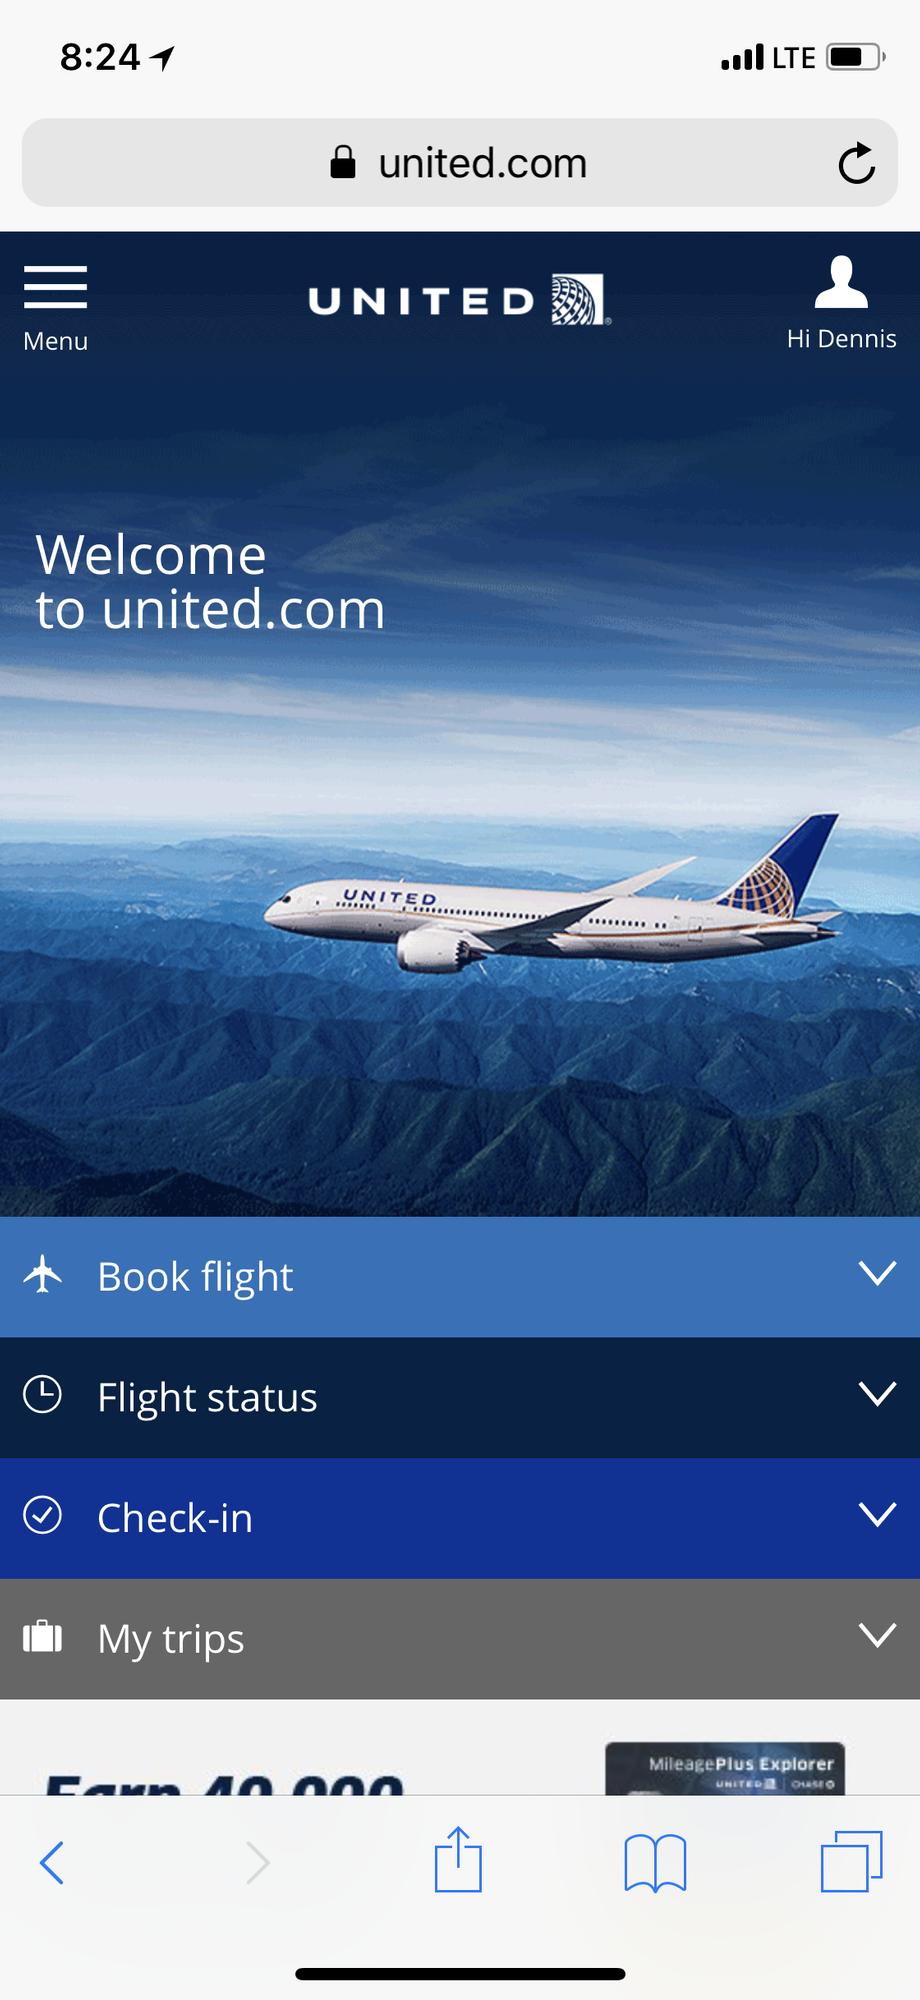 New mobile united com site? - FlyerTalk Forums